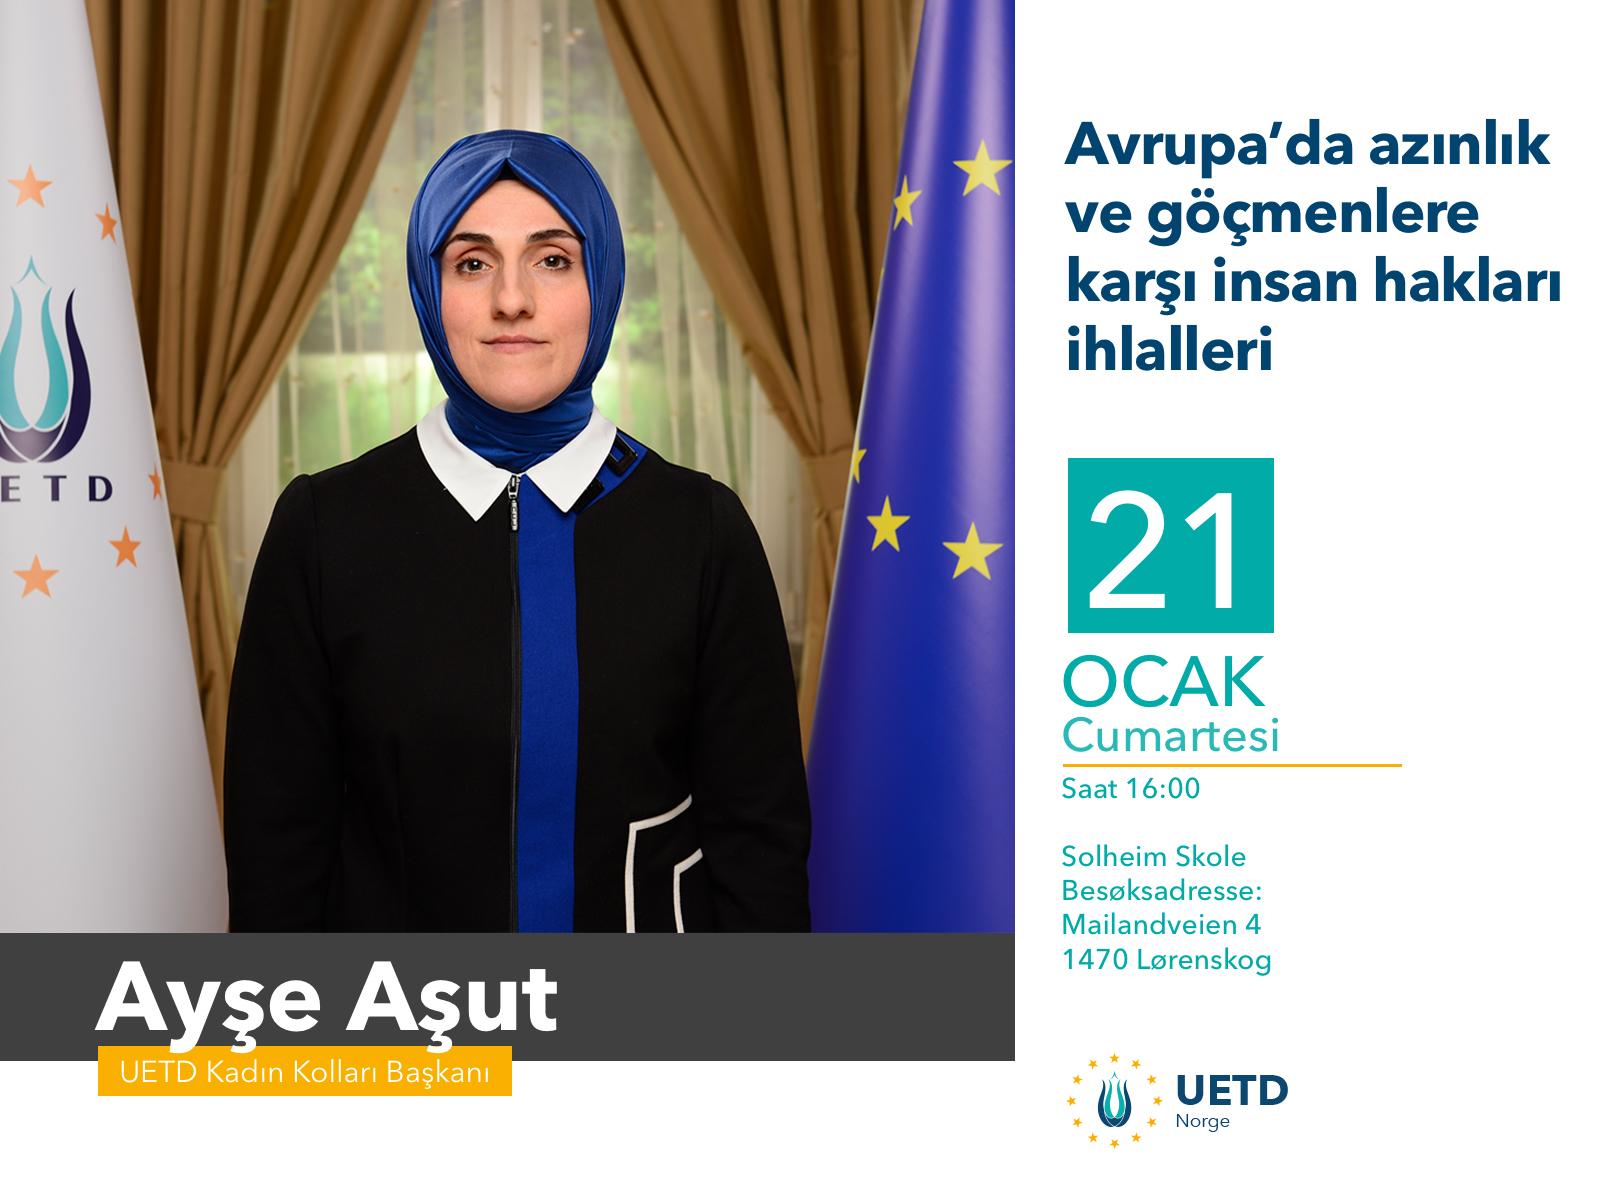 UETD_Konferanslar2017_Ayse-Asut_Norvec_170121 (1)